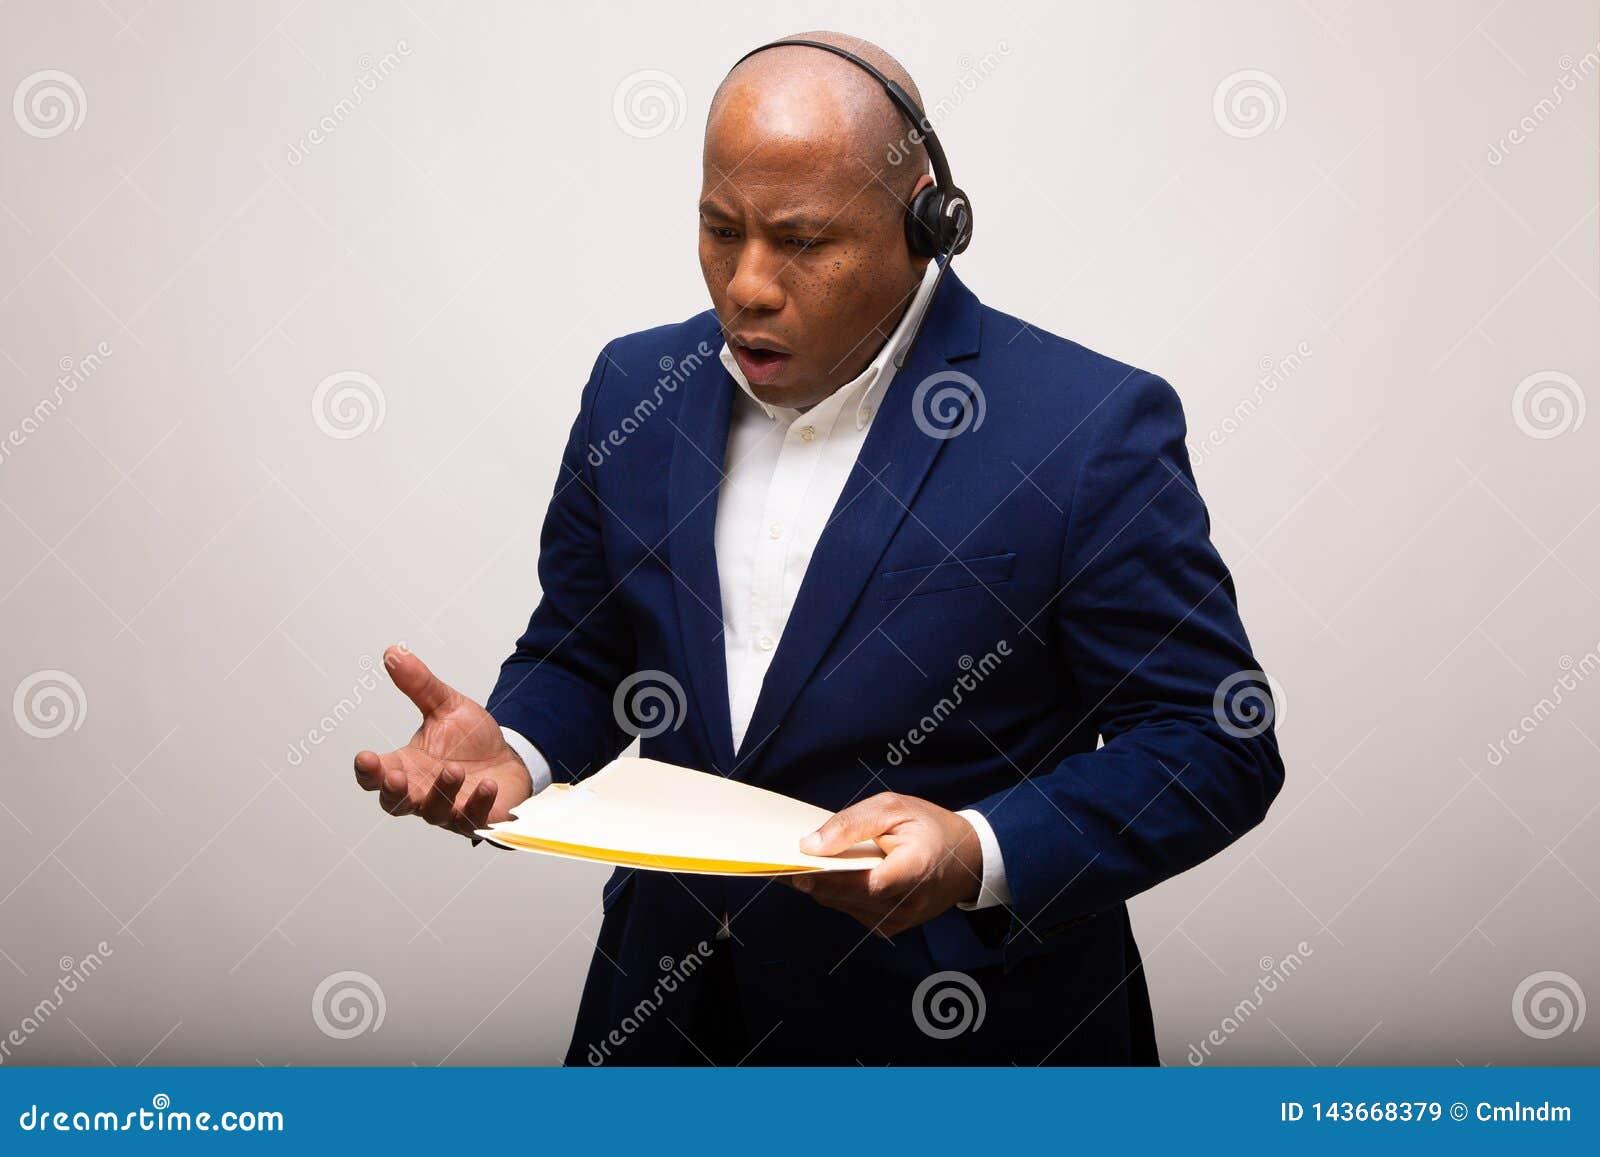 Upset African American Businessman Talks Through Headset